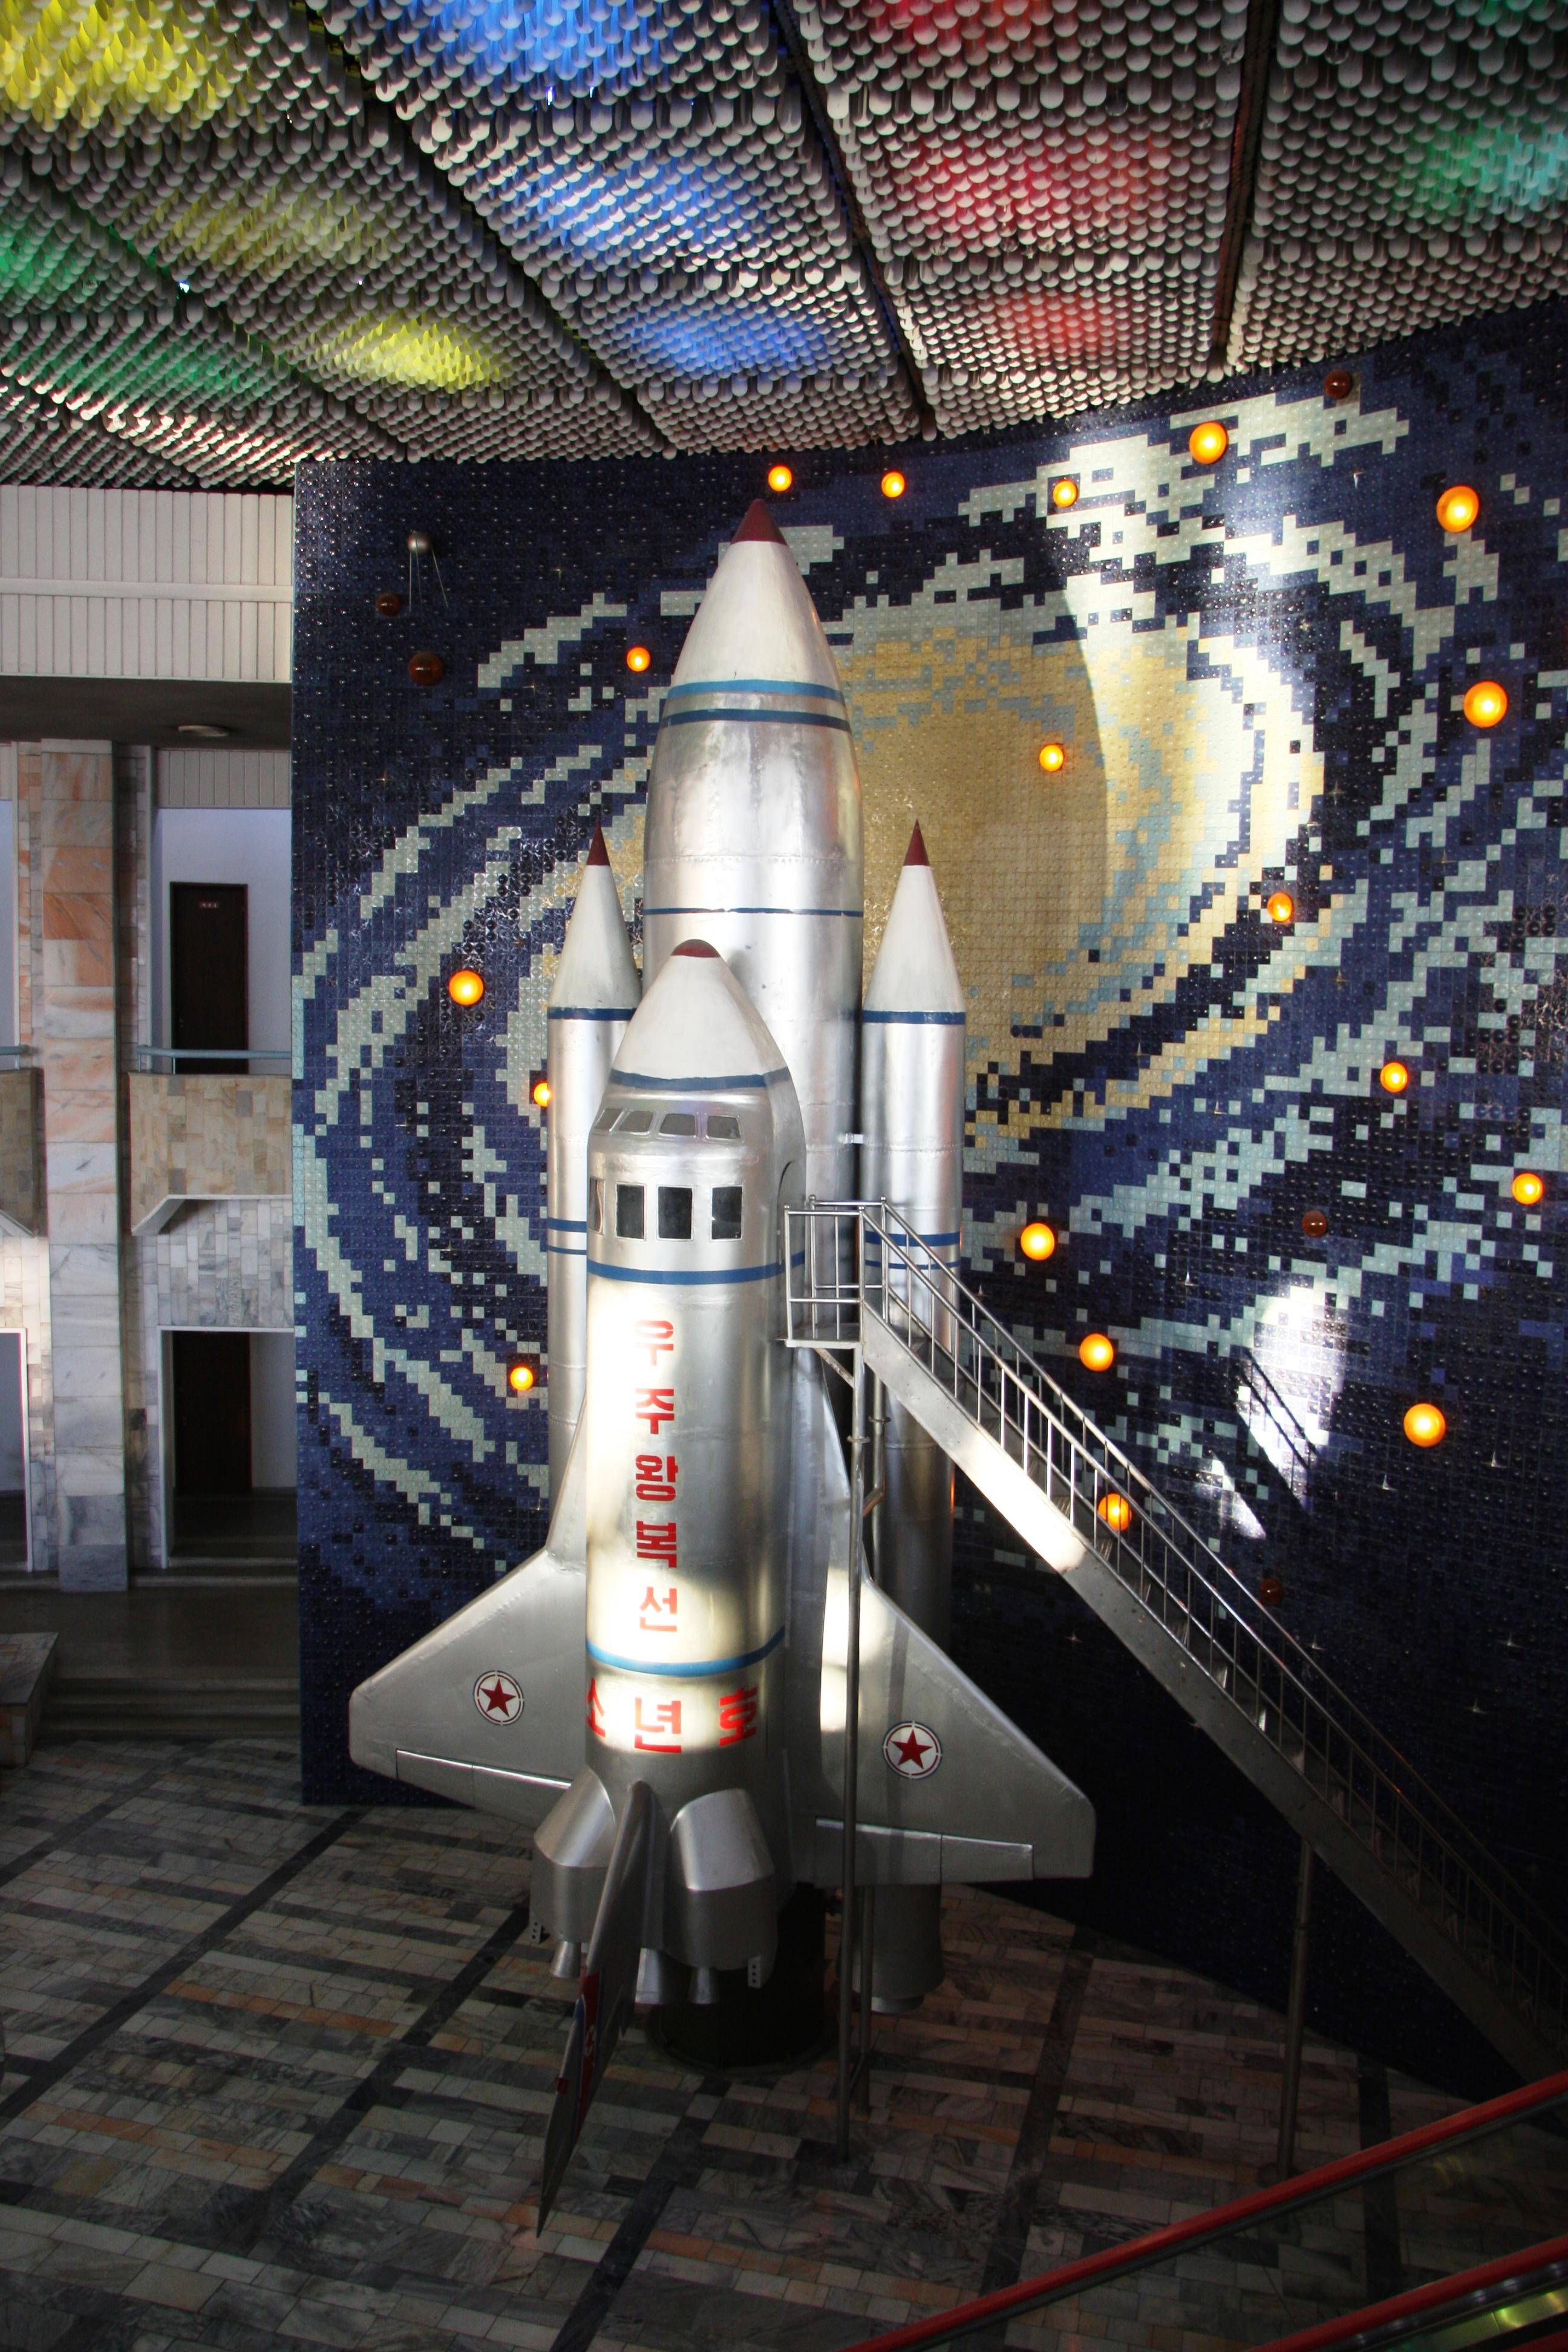 space shuttle programming language - photo #16